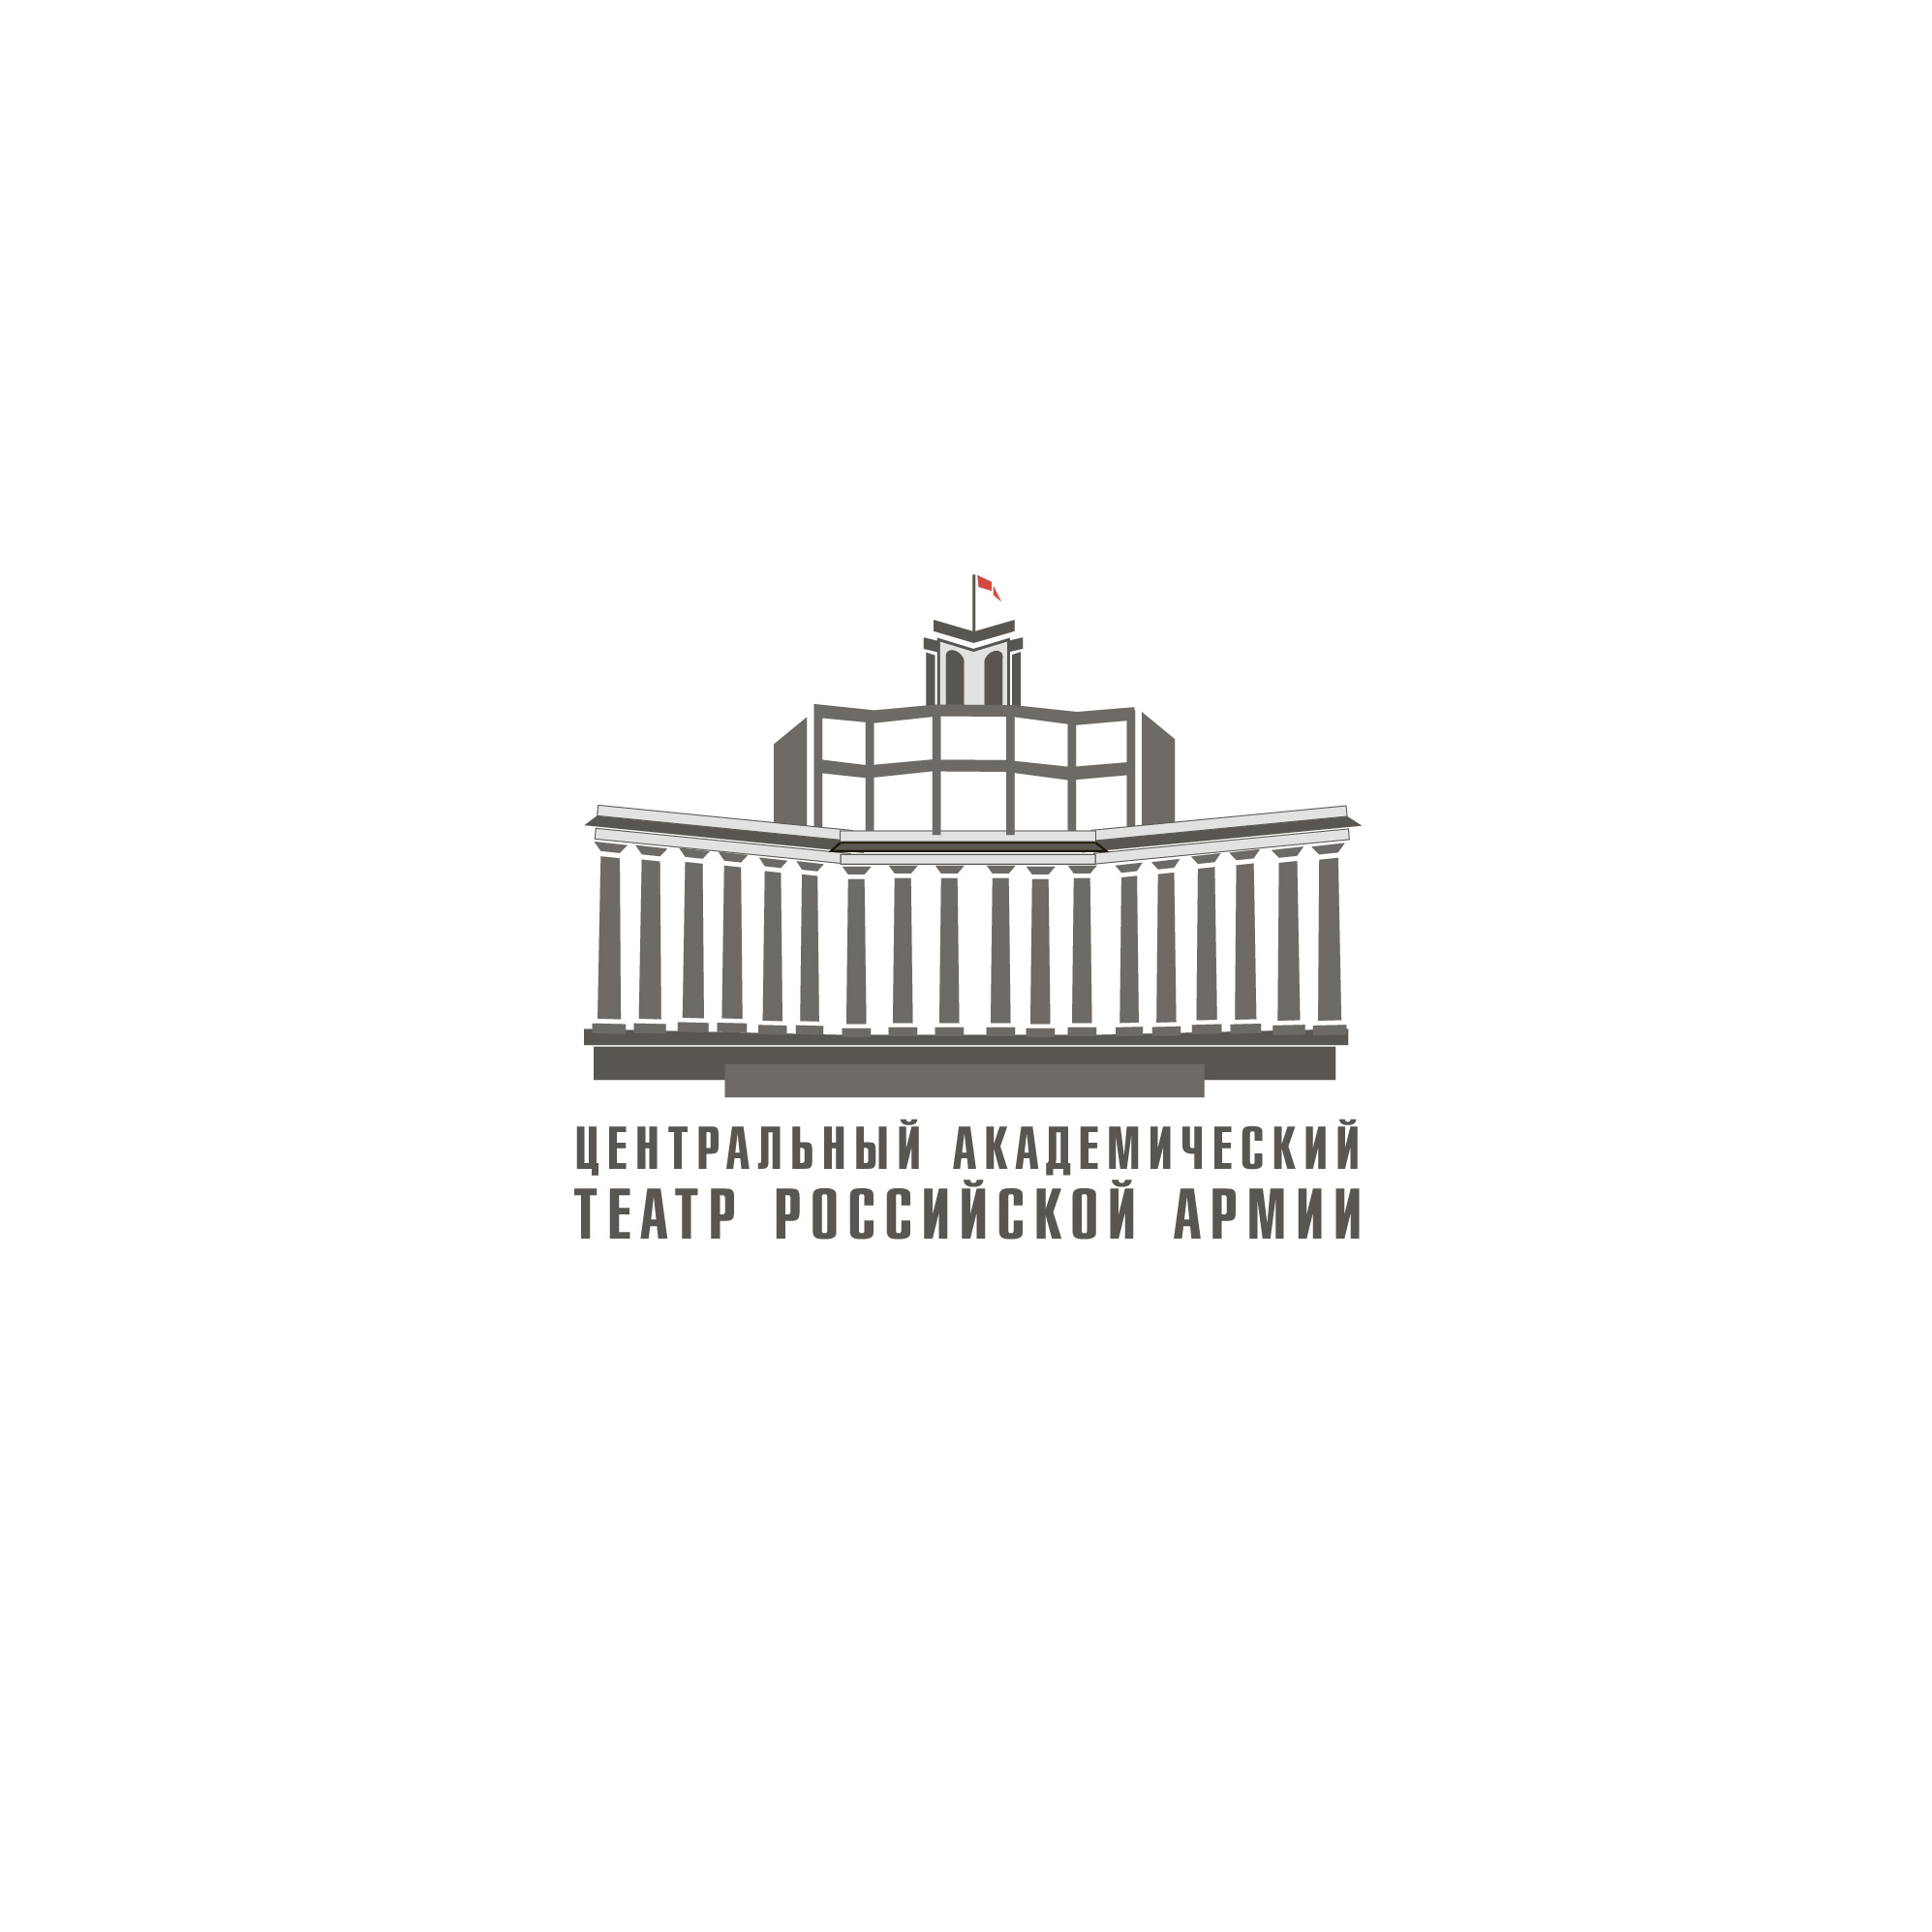 Разработка логотипа для Театра Российской Армии фото f_907587fa15aa2bf4.jpg